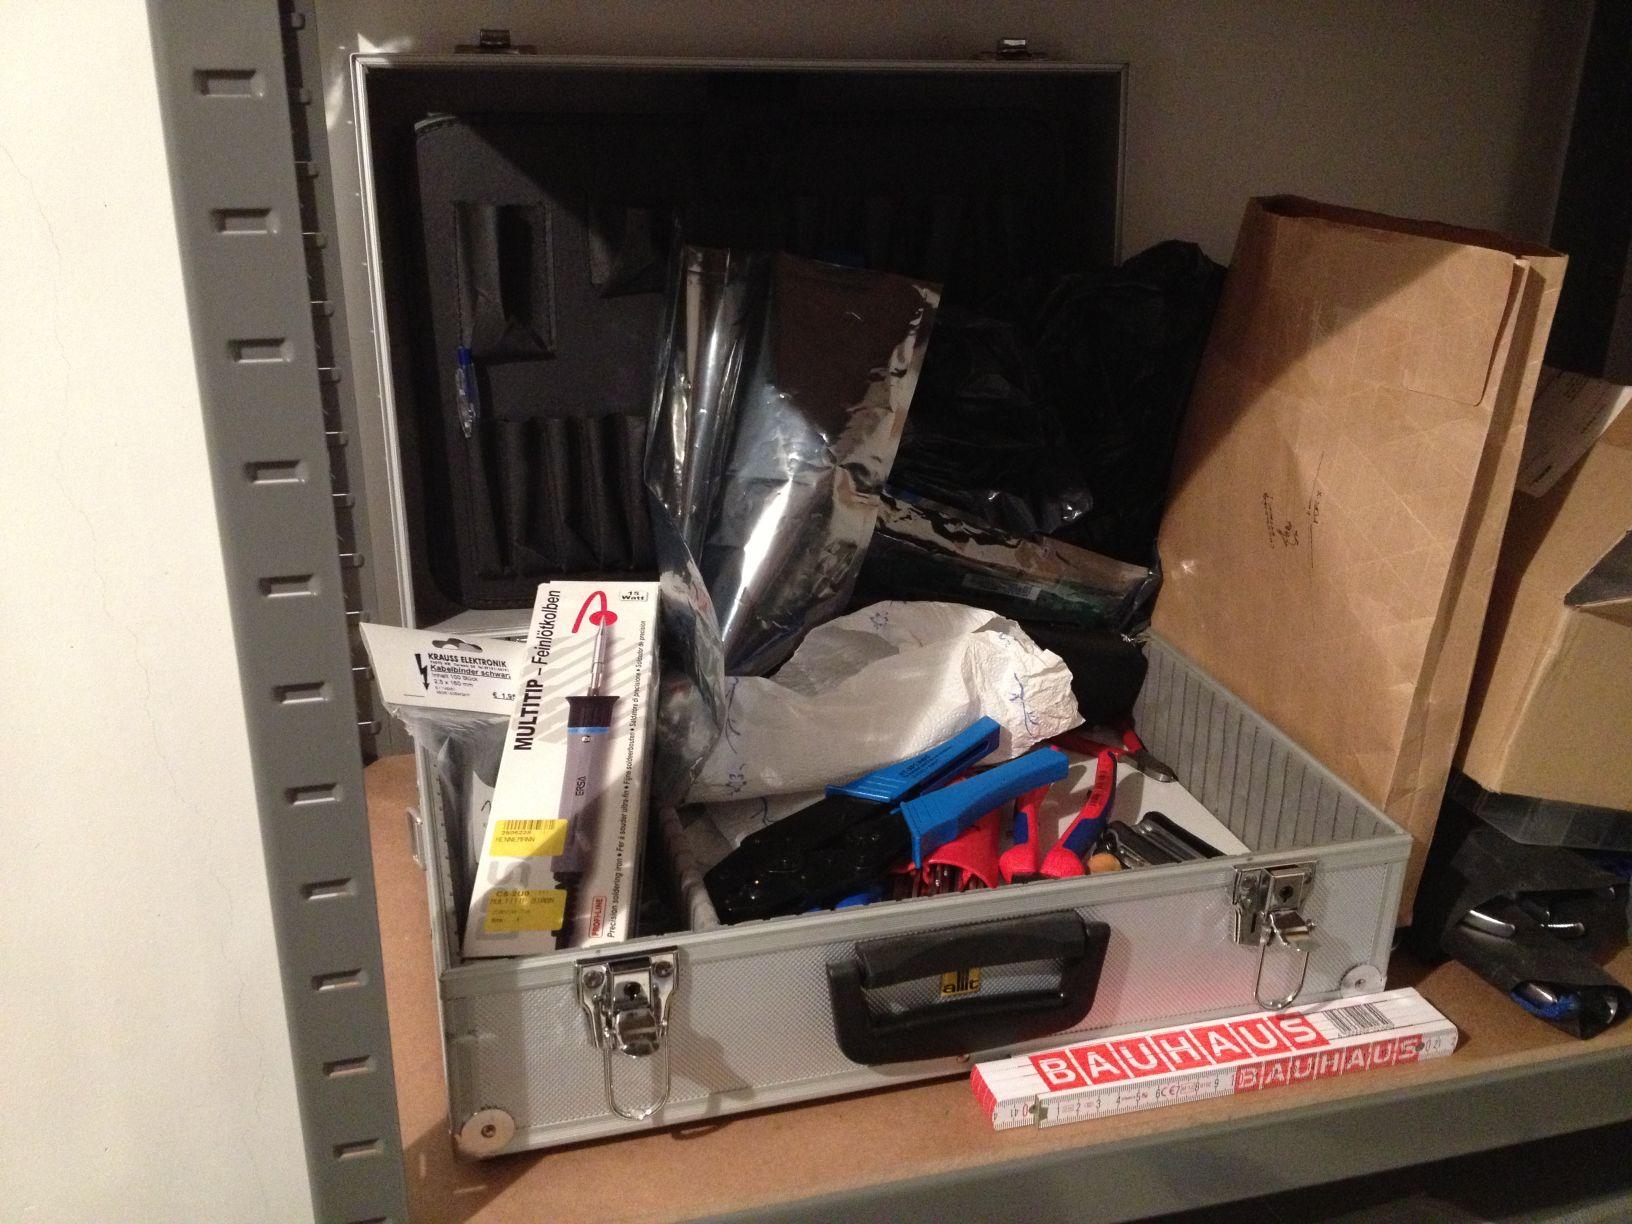 [TAGEBUCH] Quick & Dirty : Keller-Retro PC Tagebuch *Von wegen abgeschlossen* Chieftec CS 601 ;-)-image001.jpg